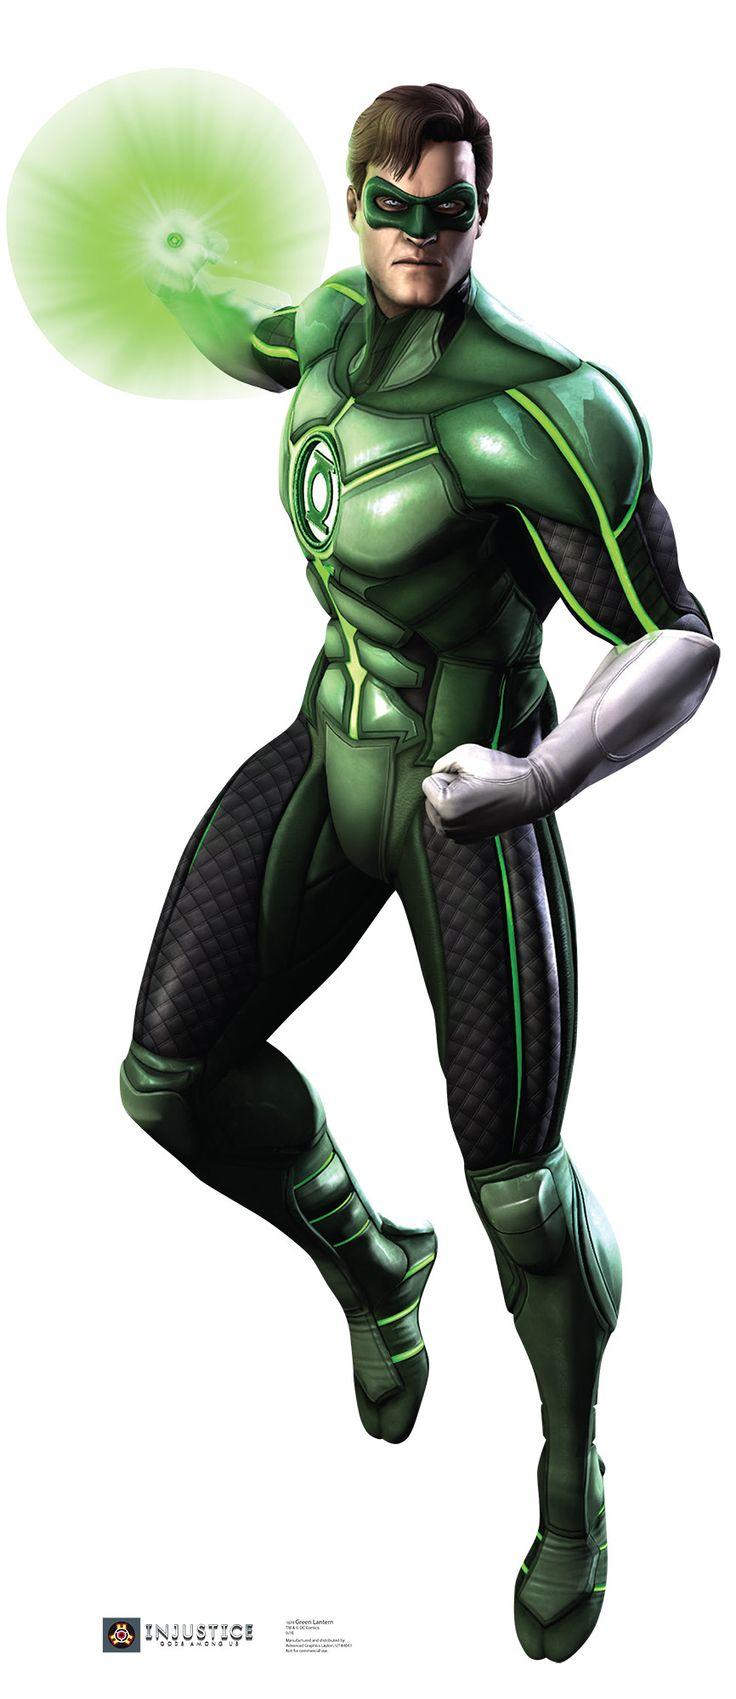 Green Lantern - Injustice DC Comics Game Cardboard Standup